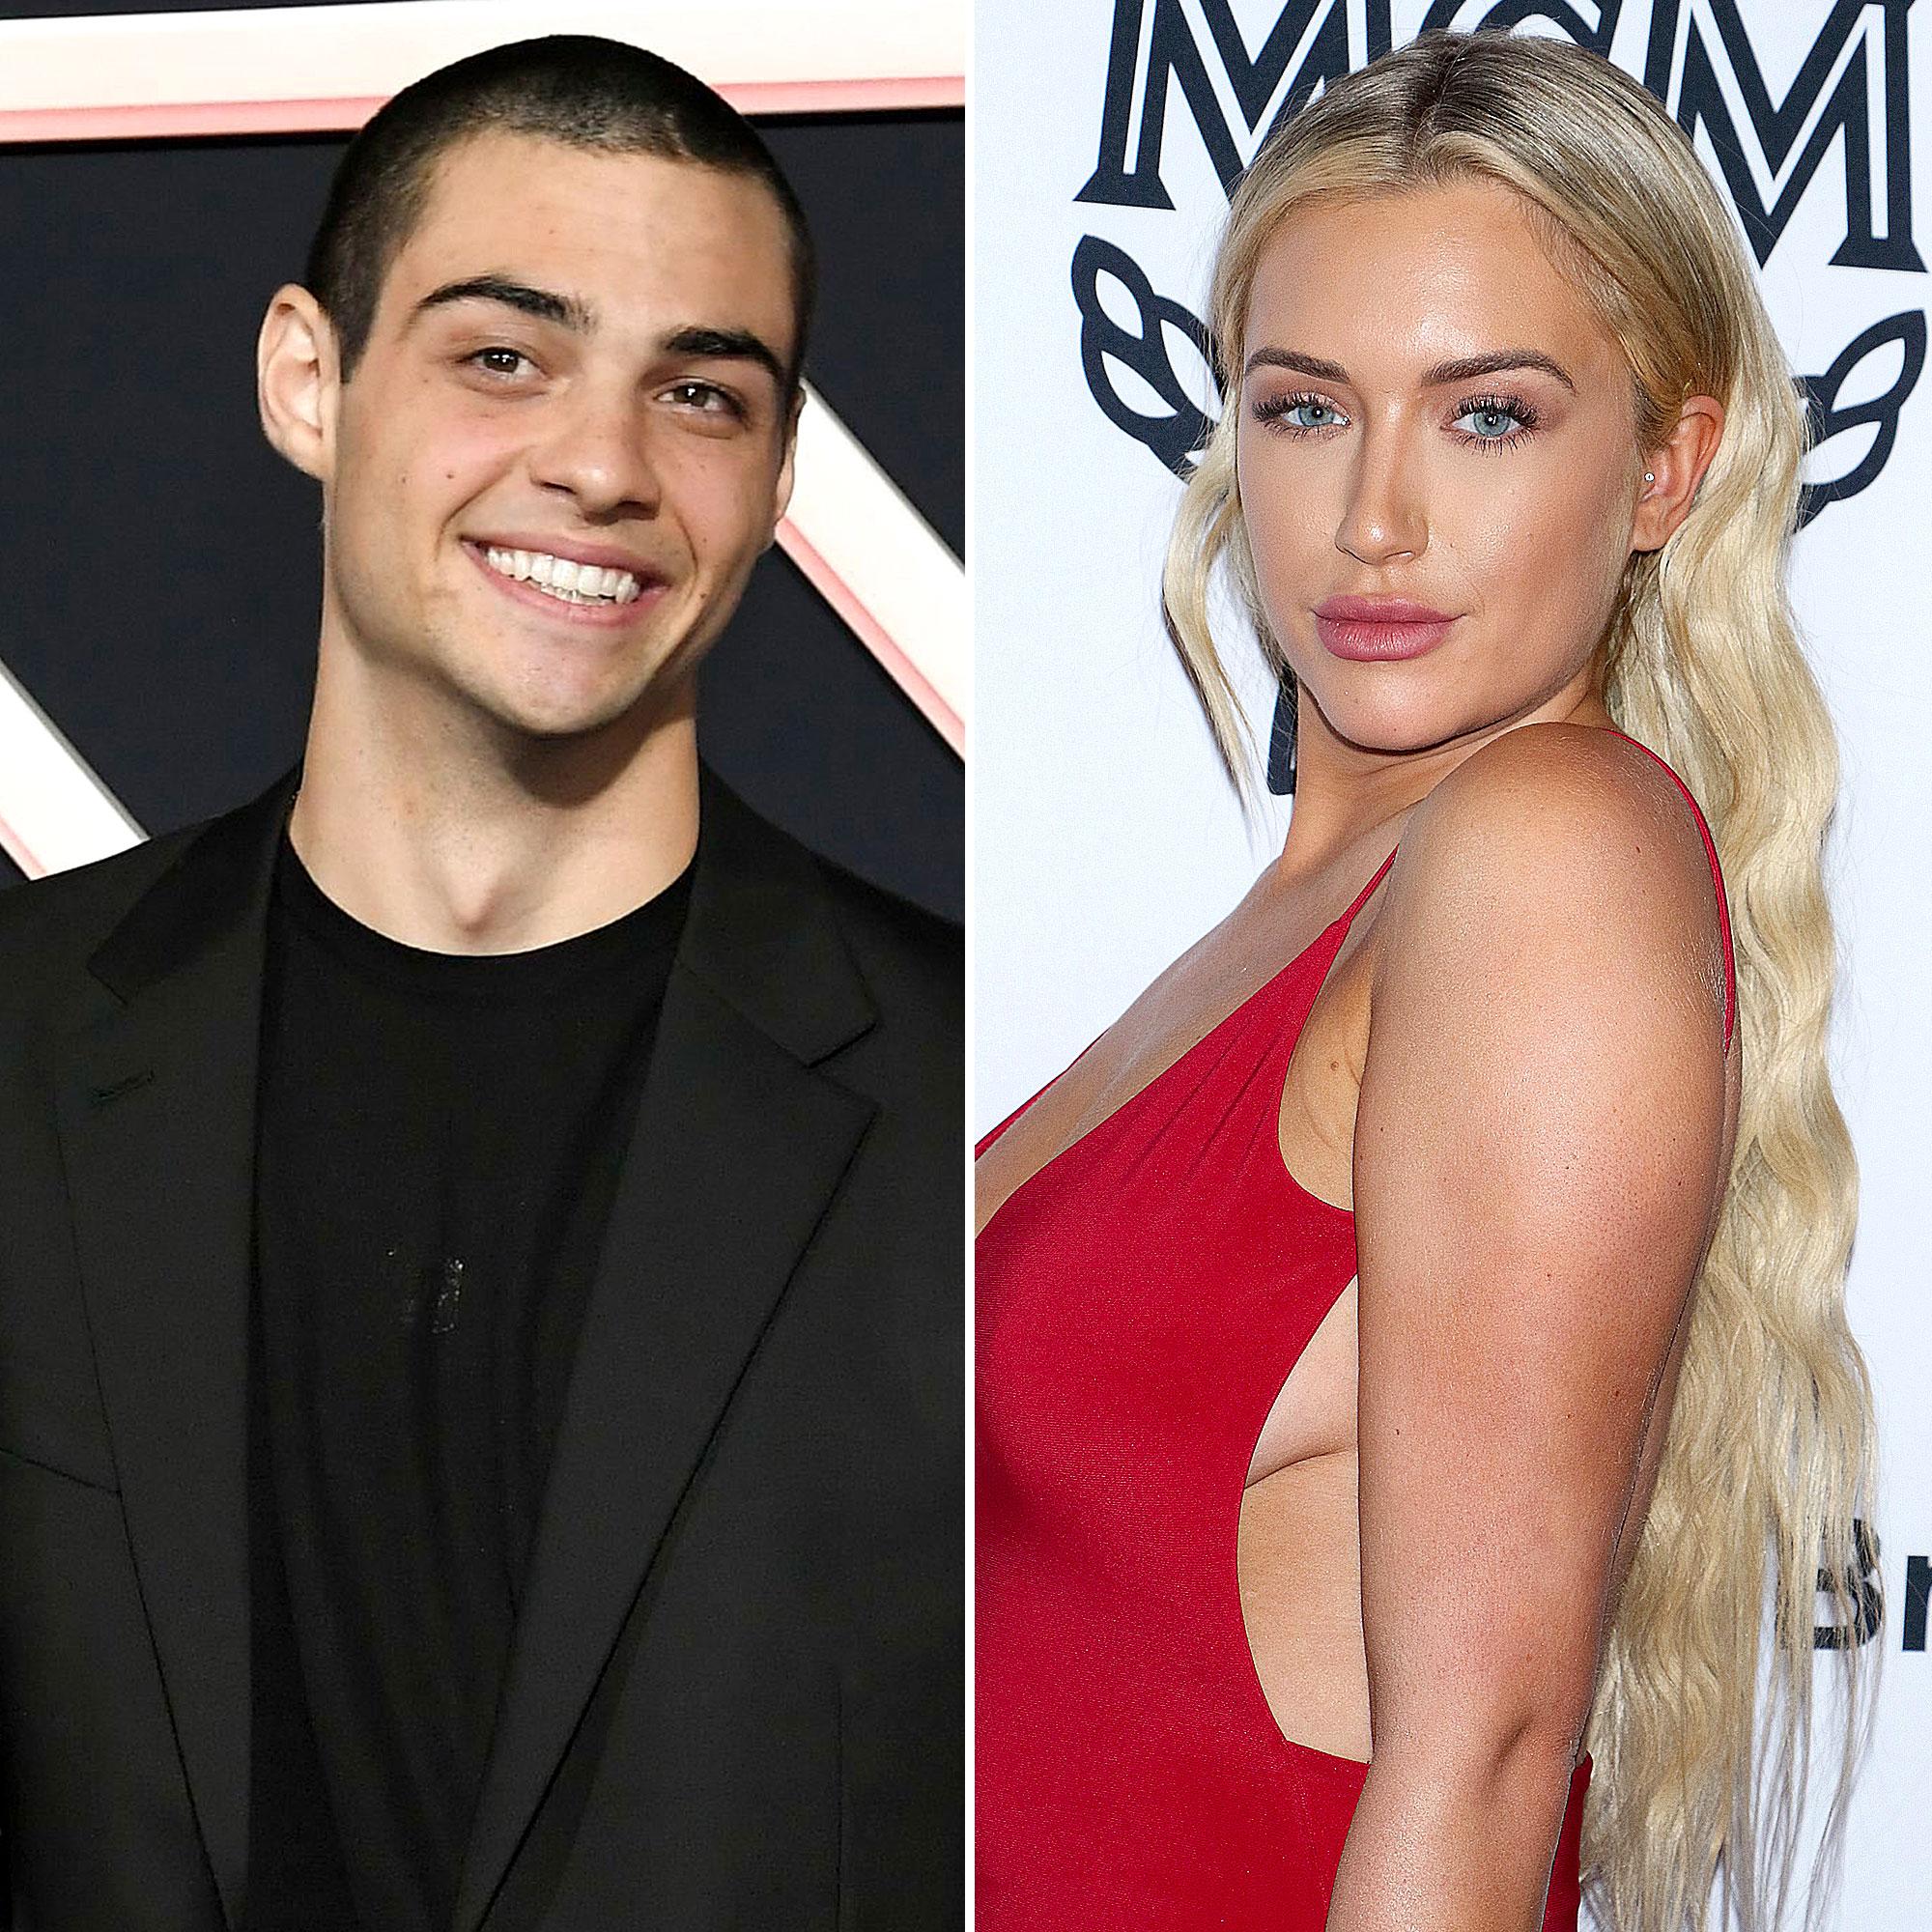 Noah Centineo Stassie Karanikolaou Confirm Relationship With Pda